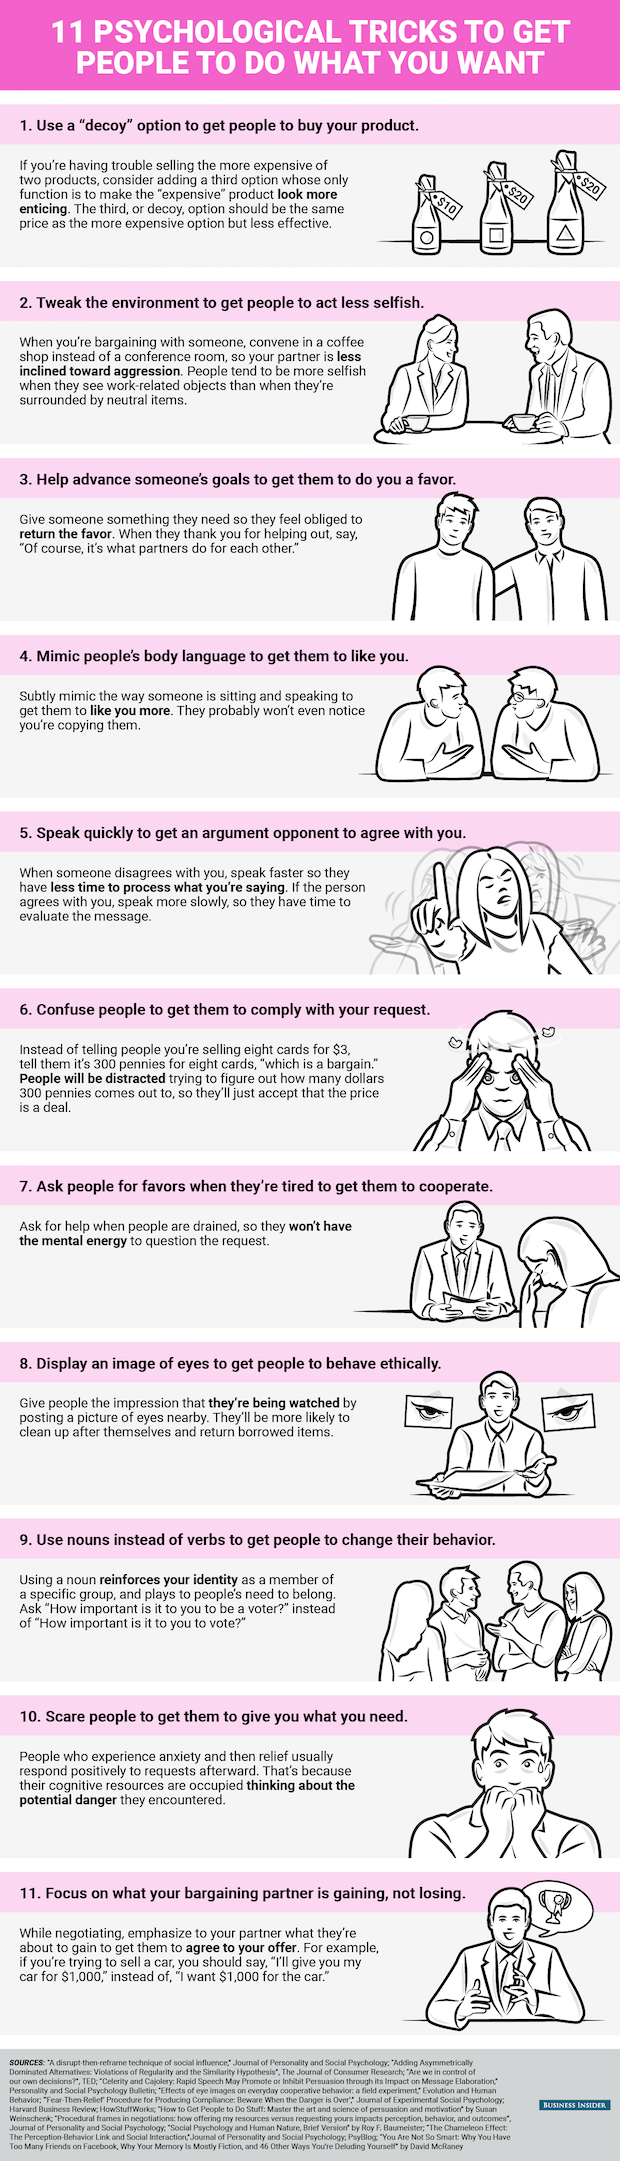 mindgames_infographic